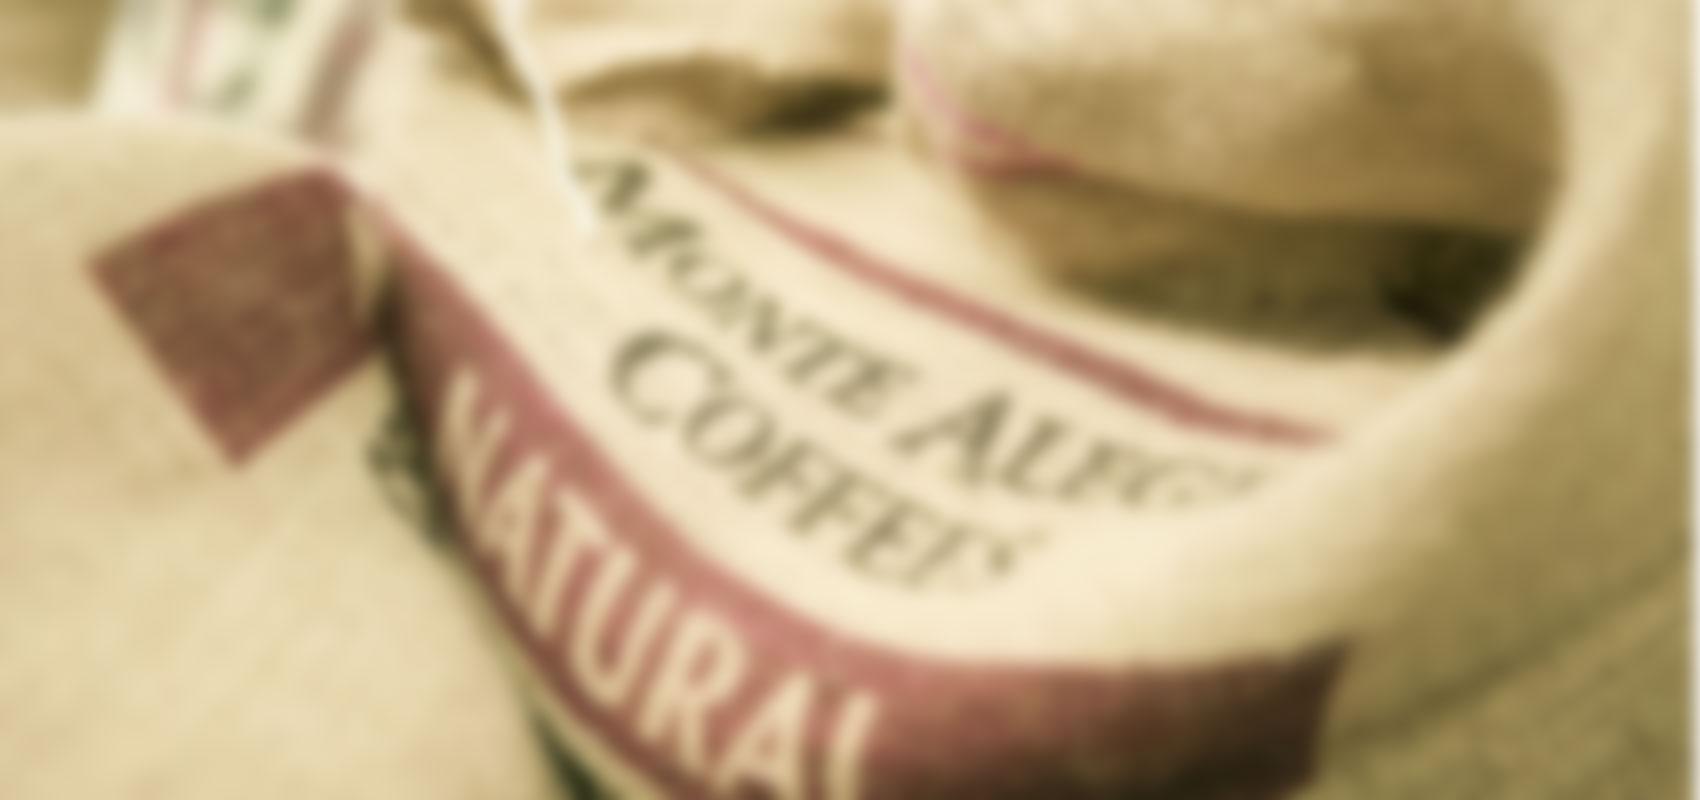 1_Caffe_Chririatti_Saecke_Blur